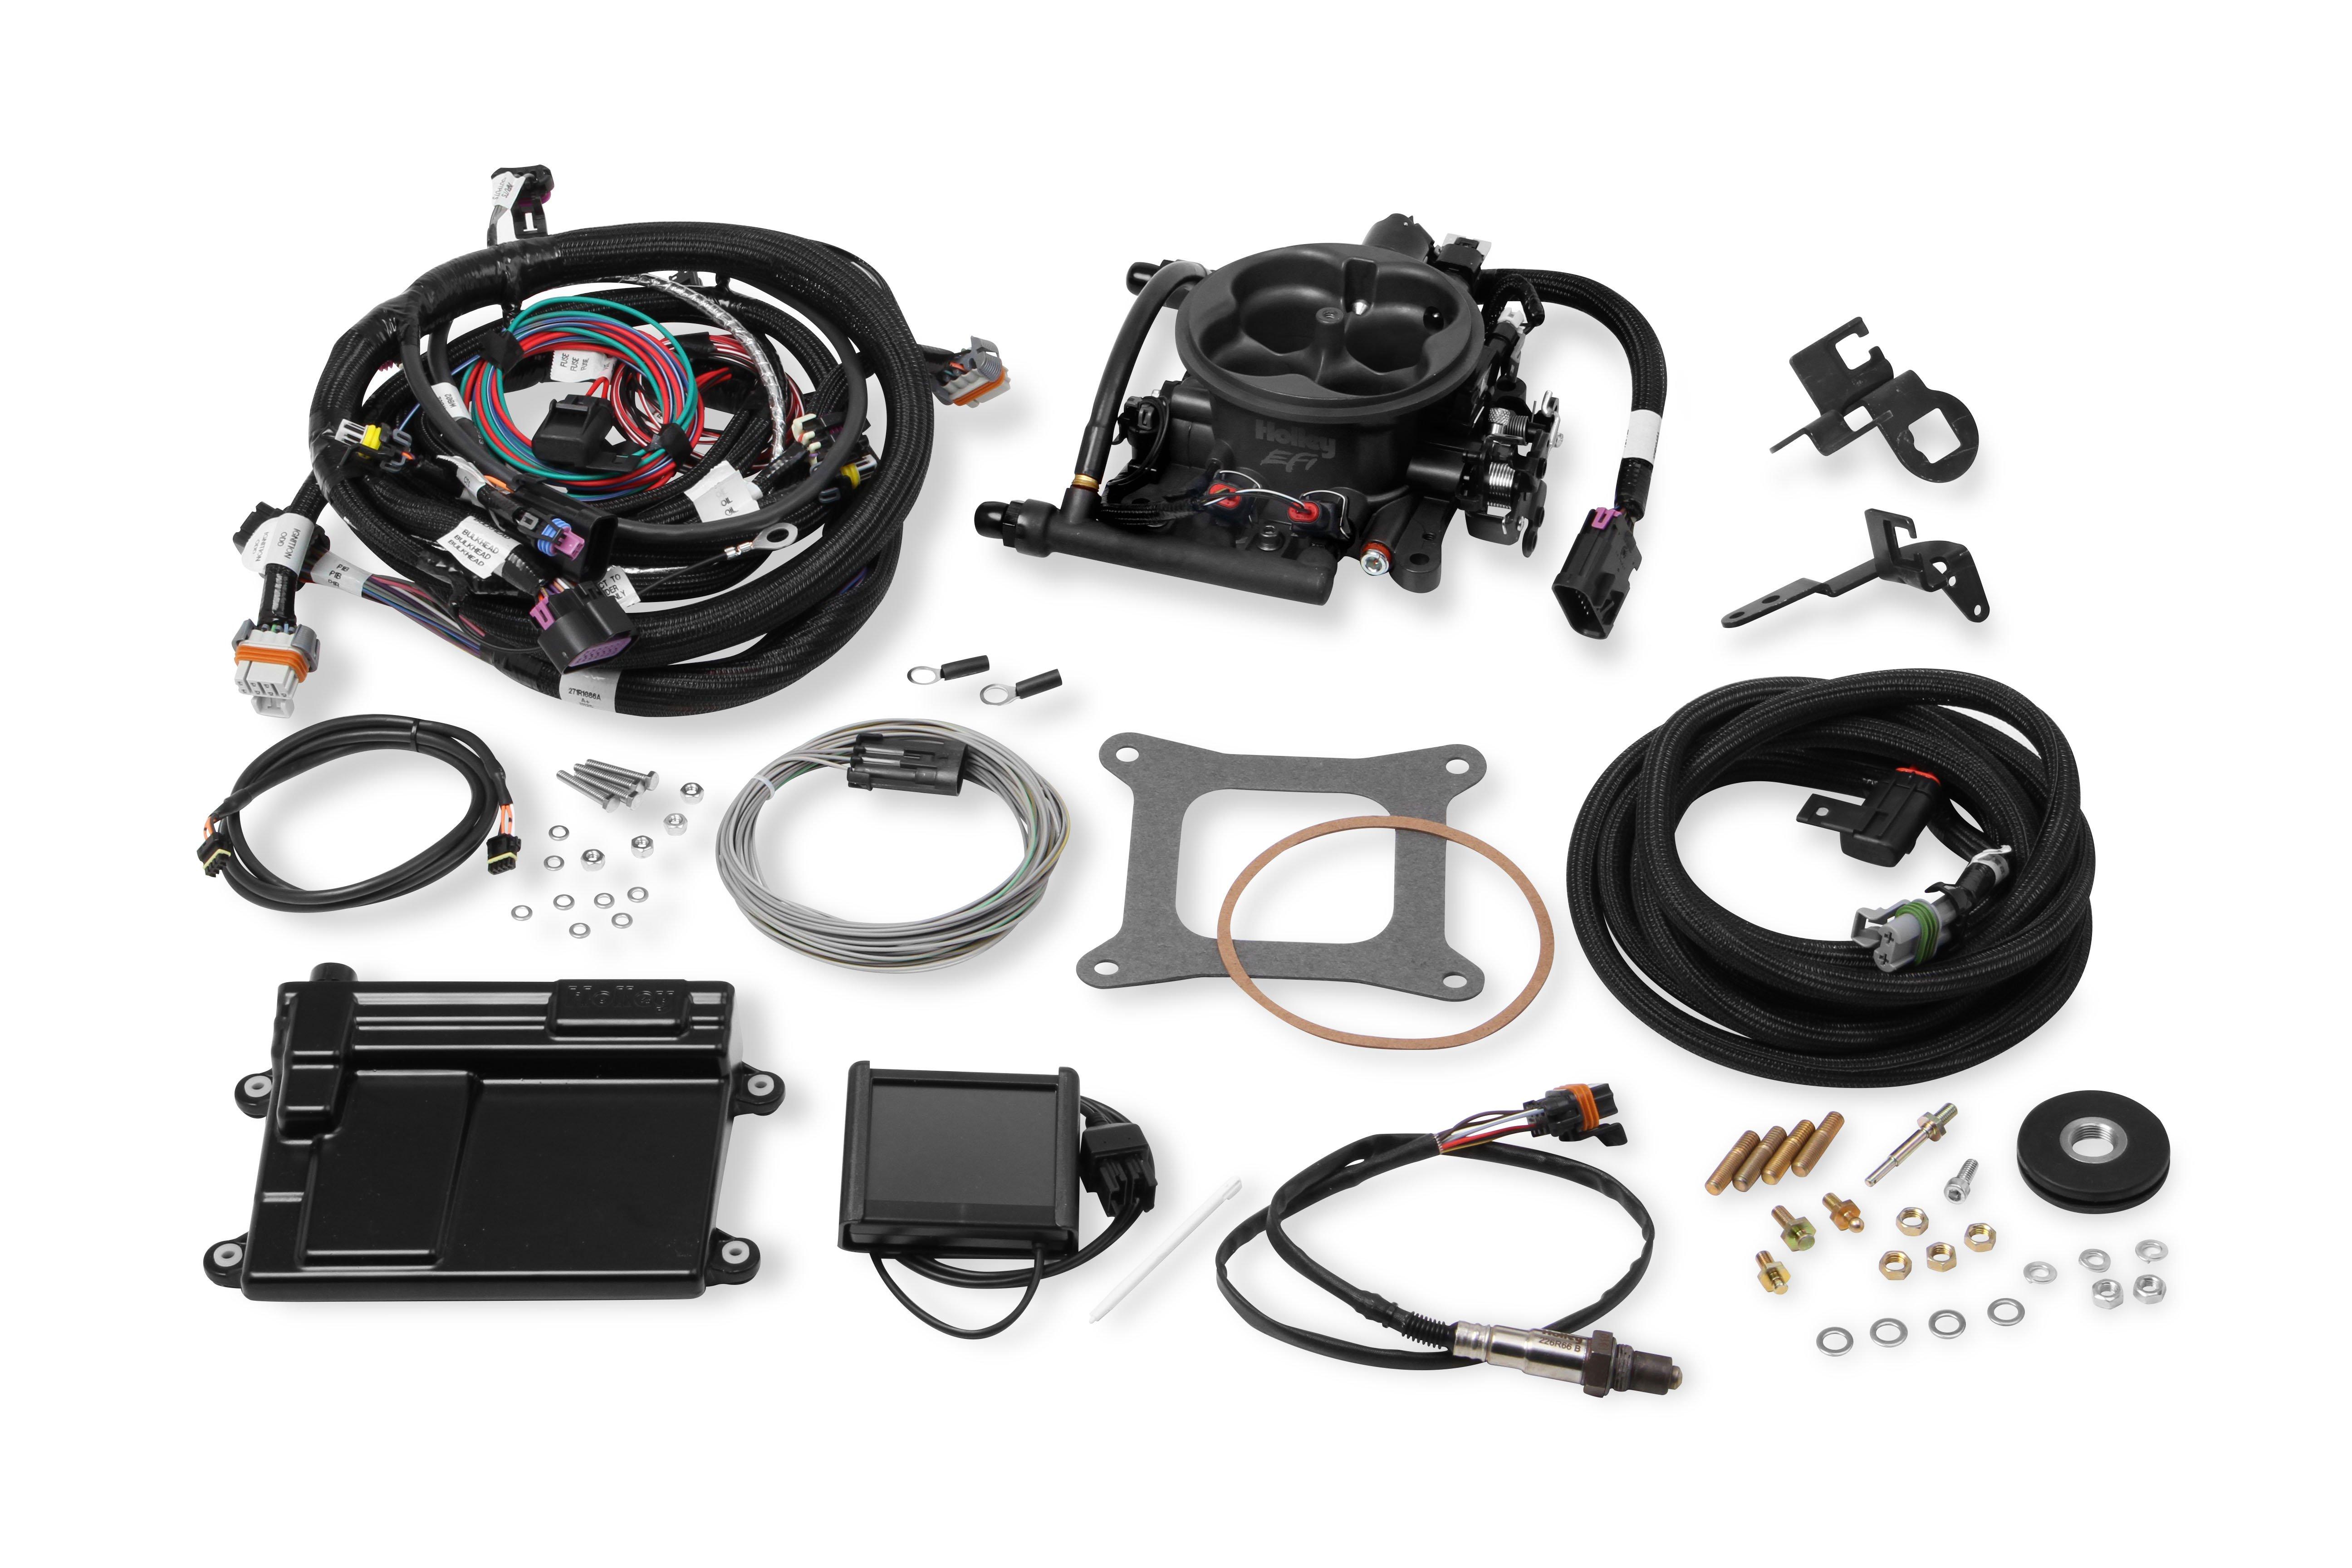 holley efi 550 410 terminator ls tbi kit hard core gray. Black Bedroom Furniture Sets. Home Design Ideas